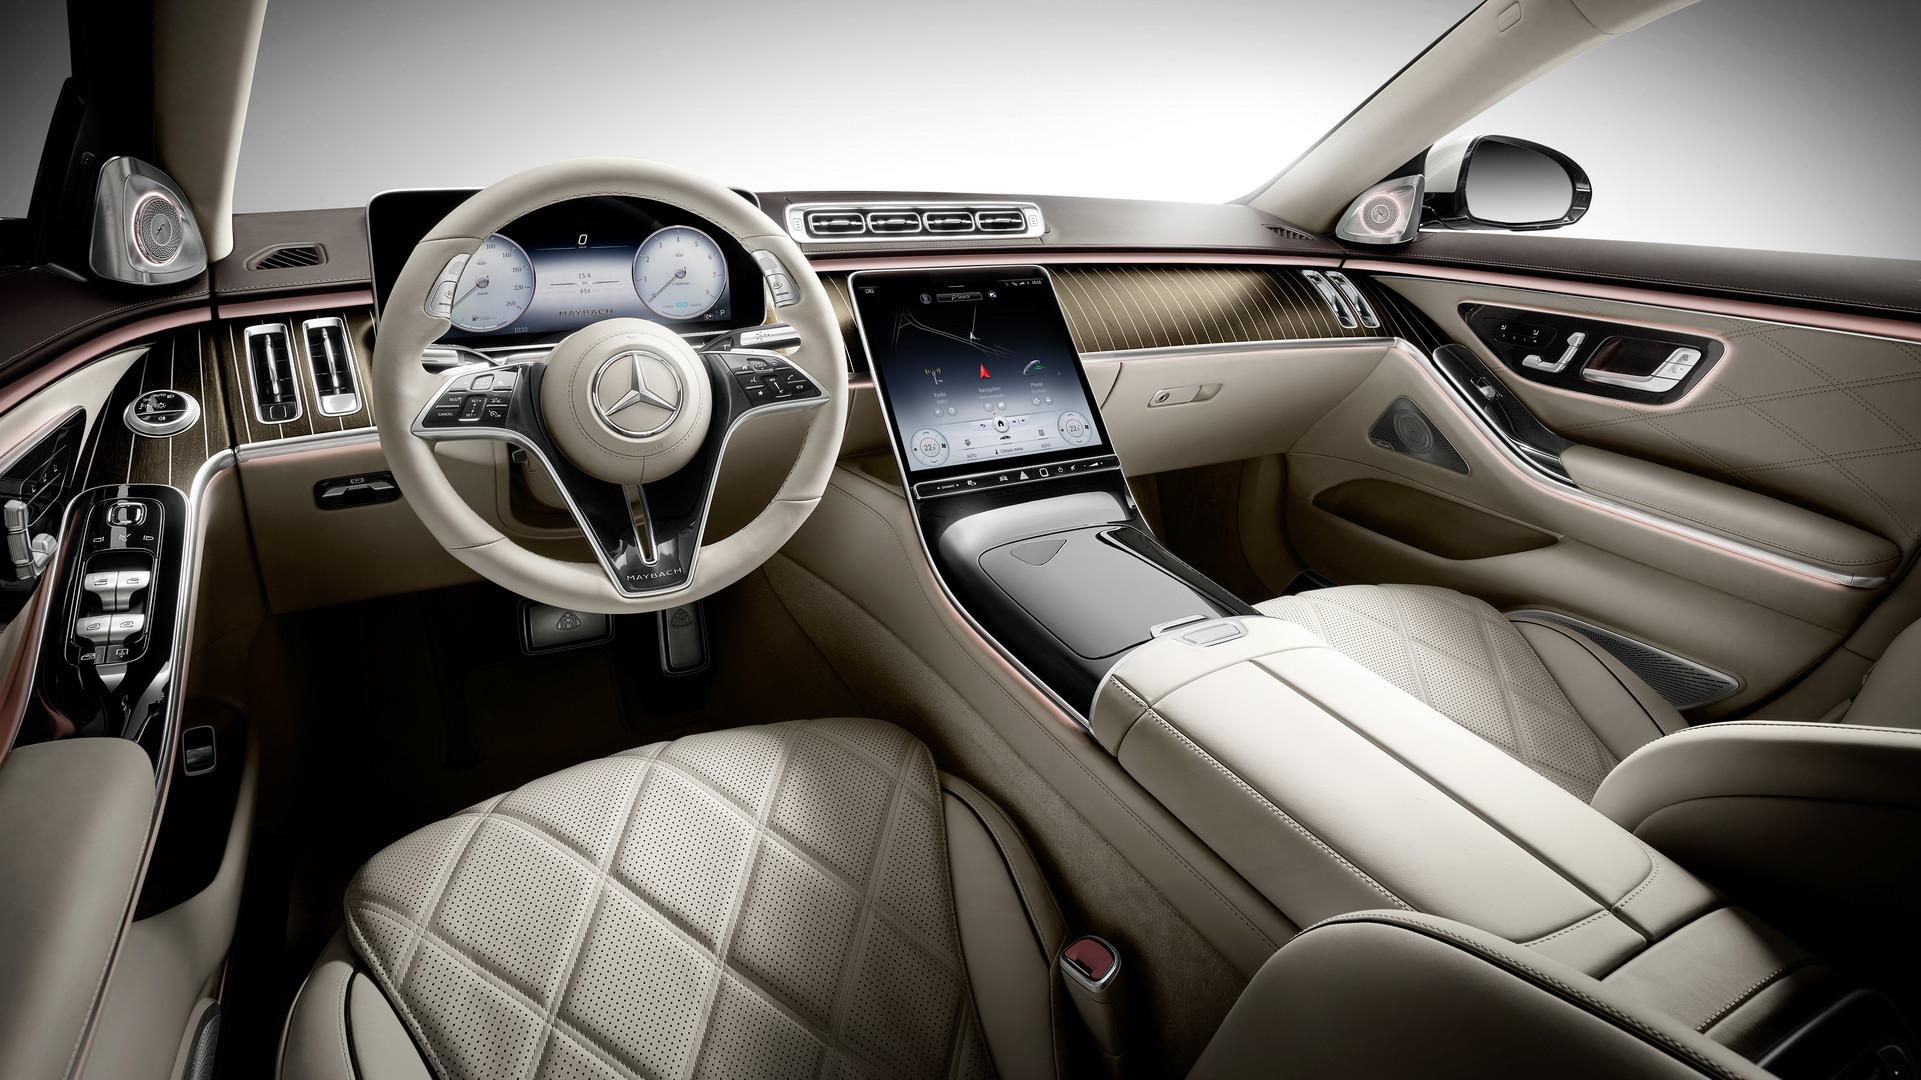 Noi-that-xe-Mercedes-Maybach-S-Class-2021-giaxehoi-vn